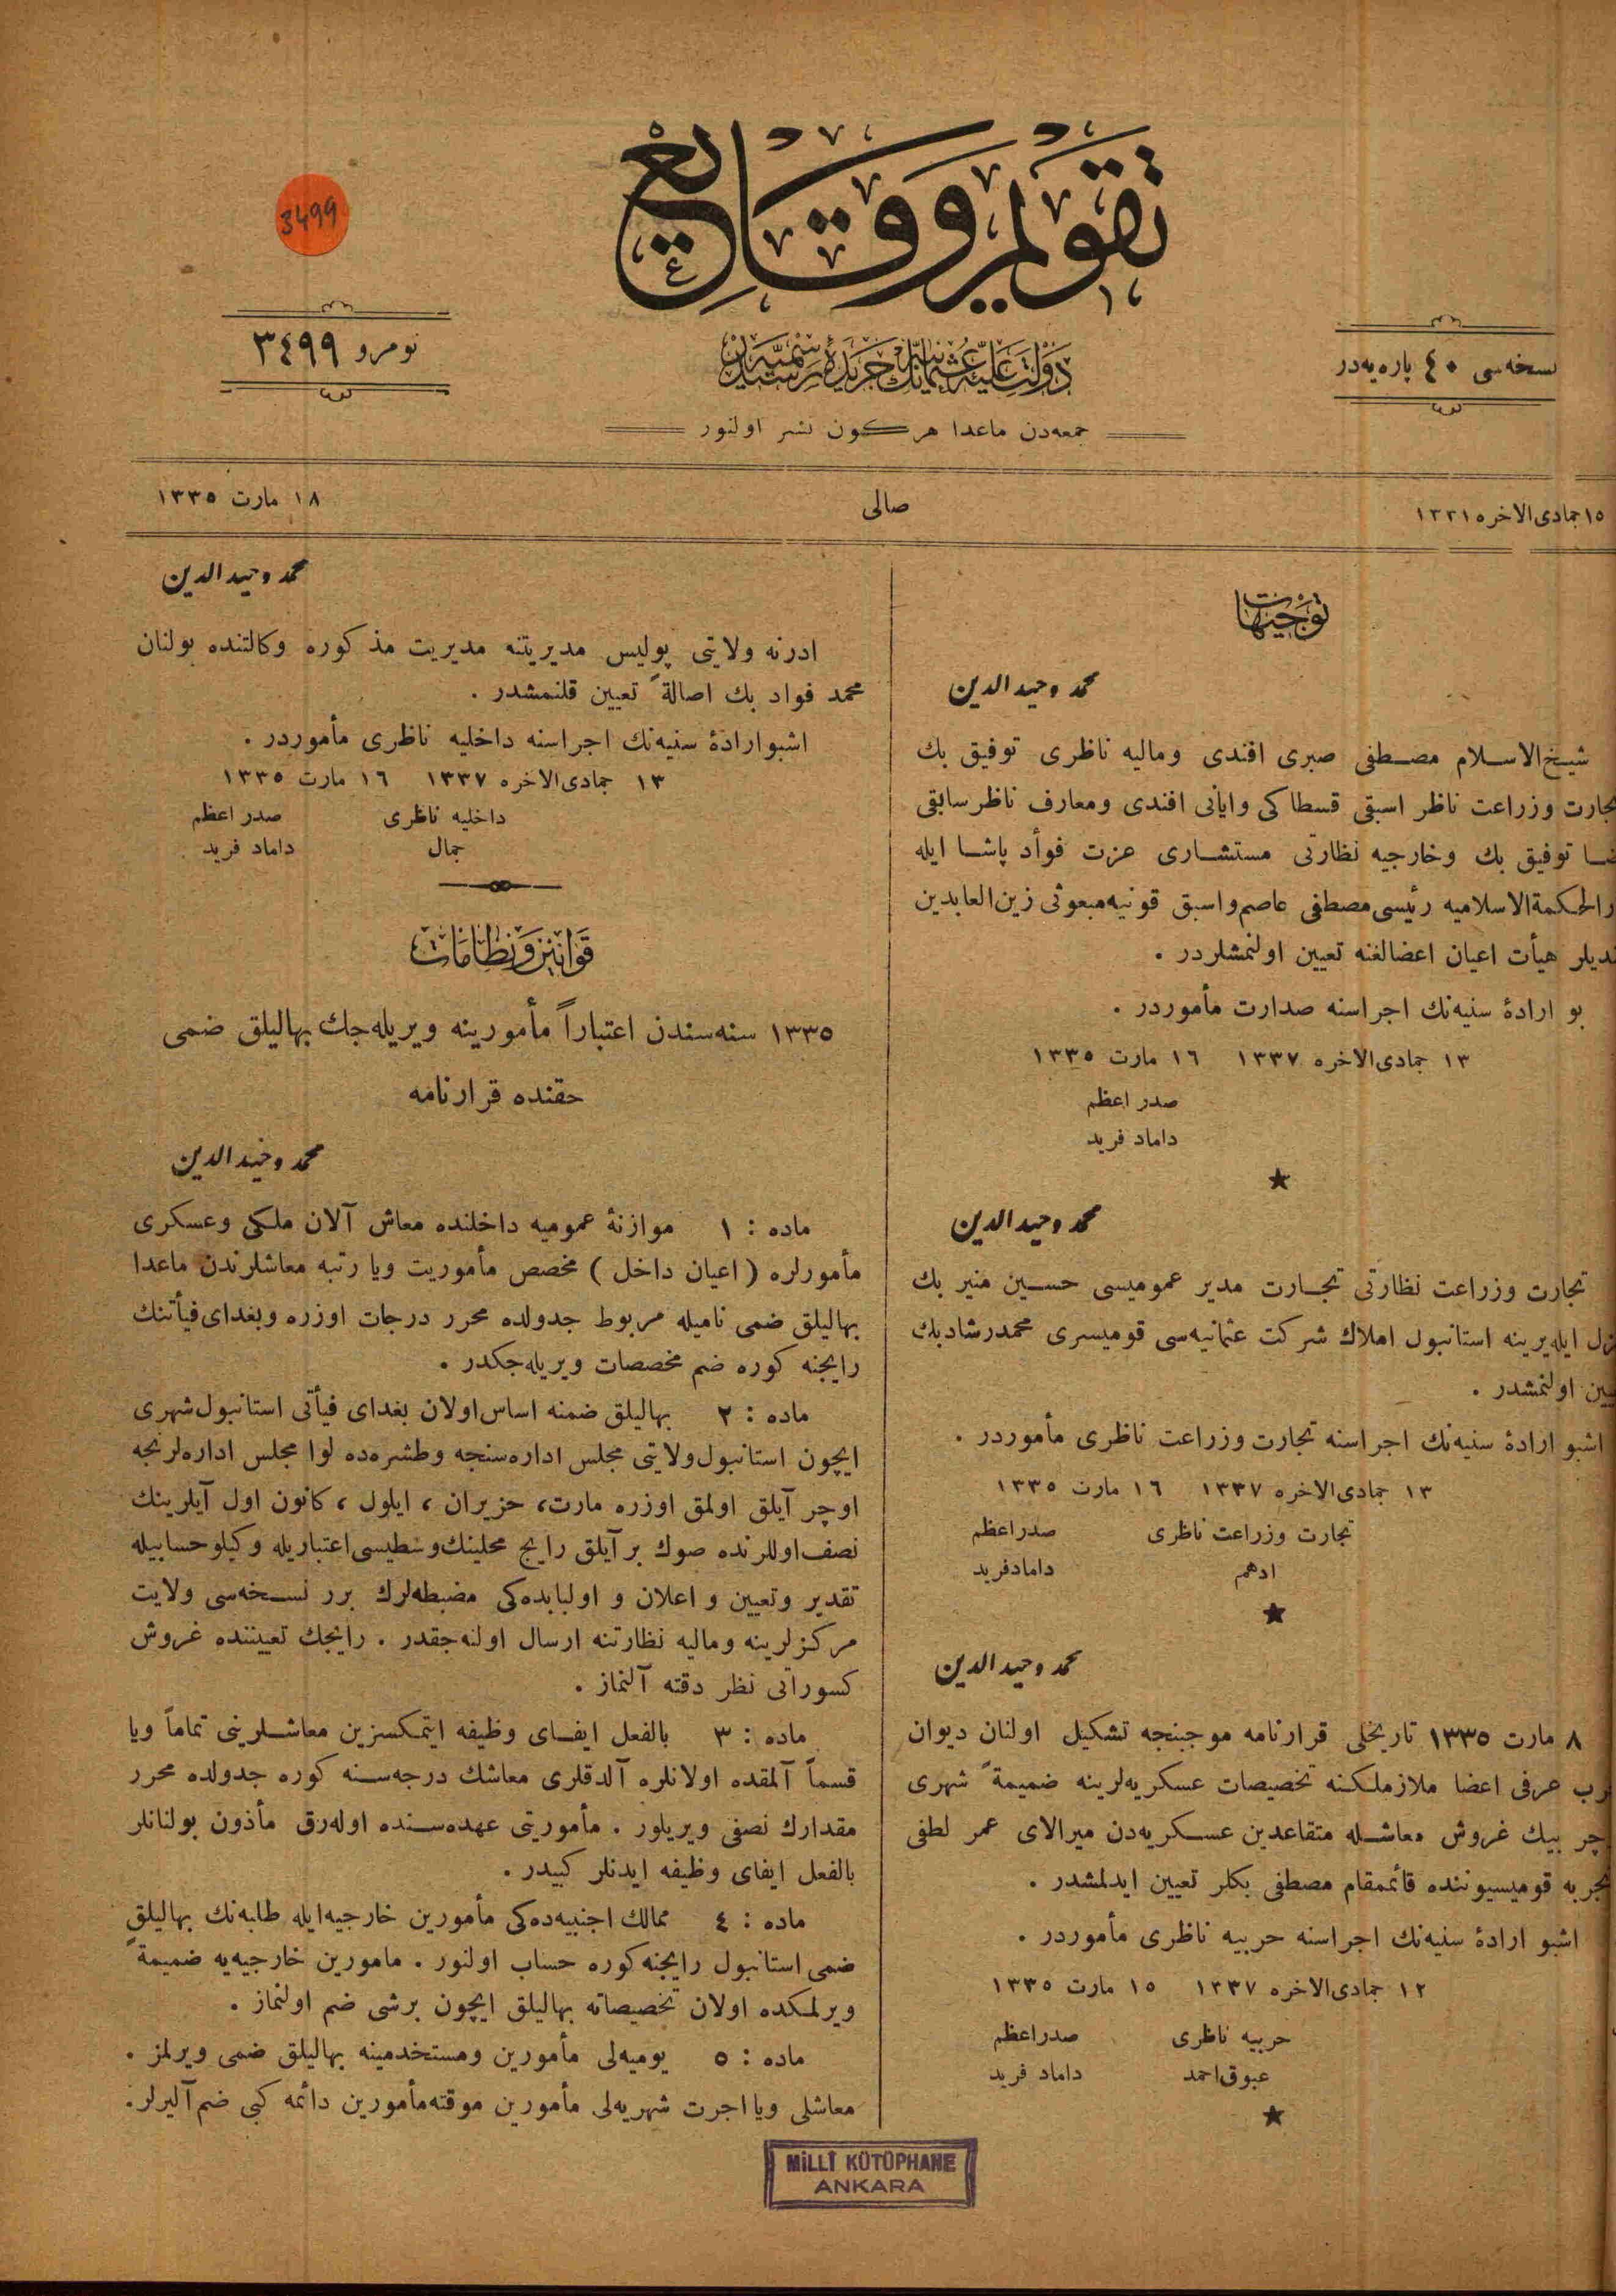 18 Mart 1919 Tarihli Takvim-i Vekayi Gazetesi Sayfa 1